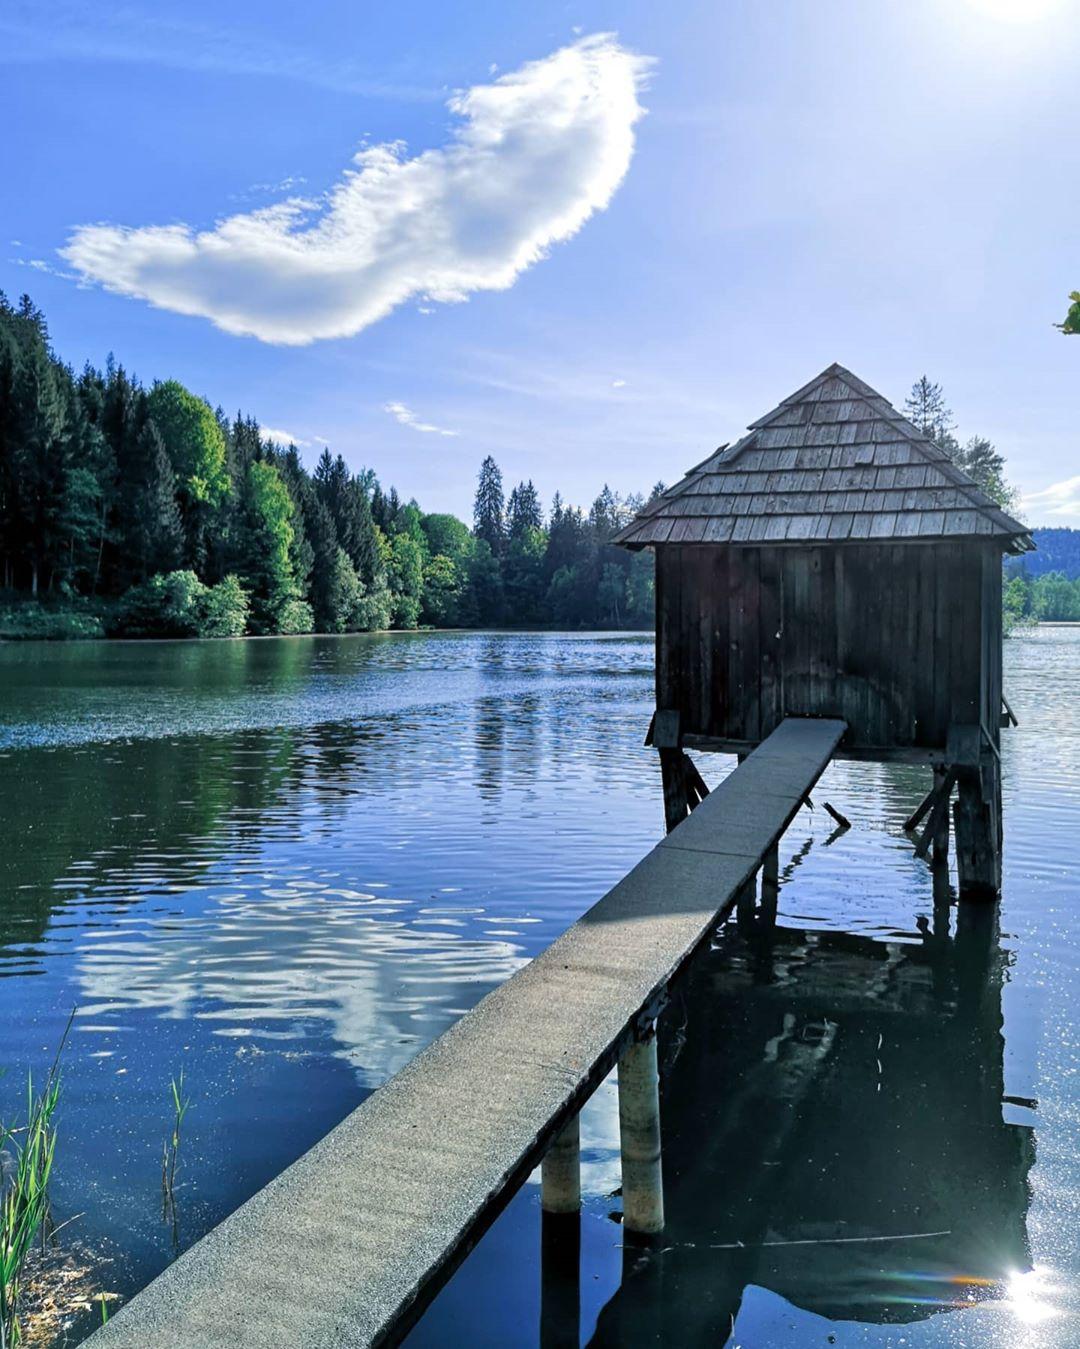 Wonderful weather at the Moosburg ponds